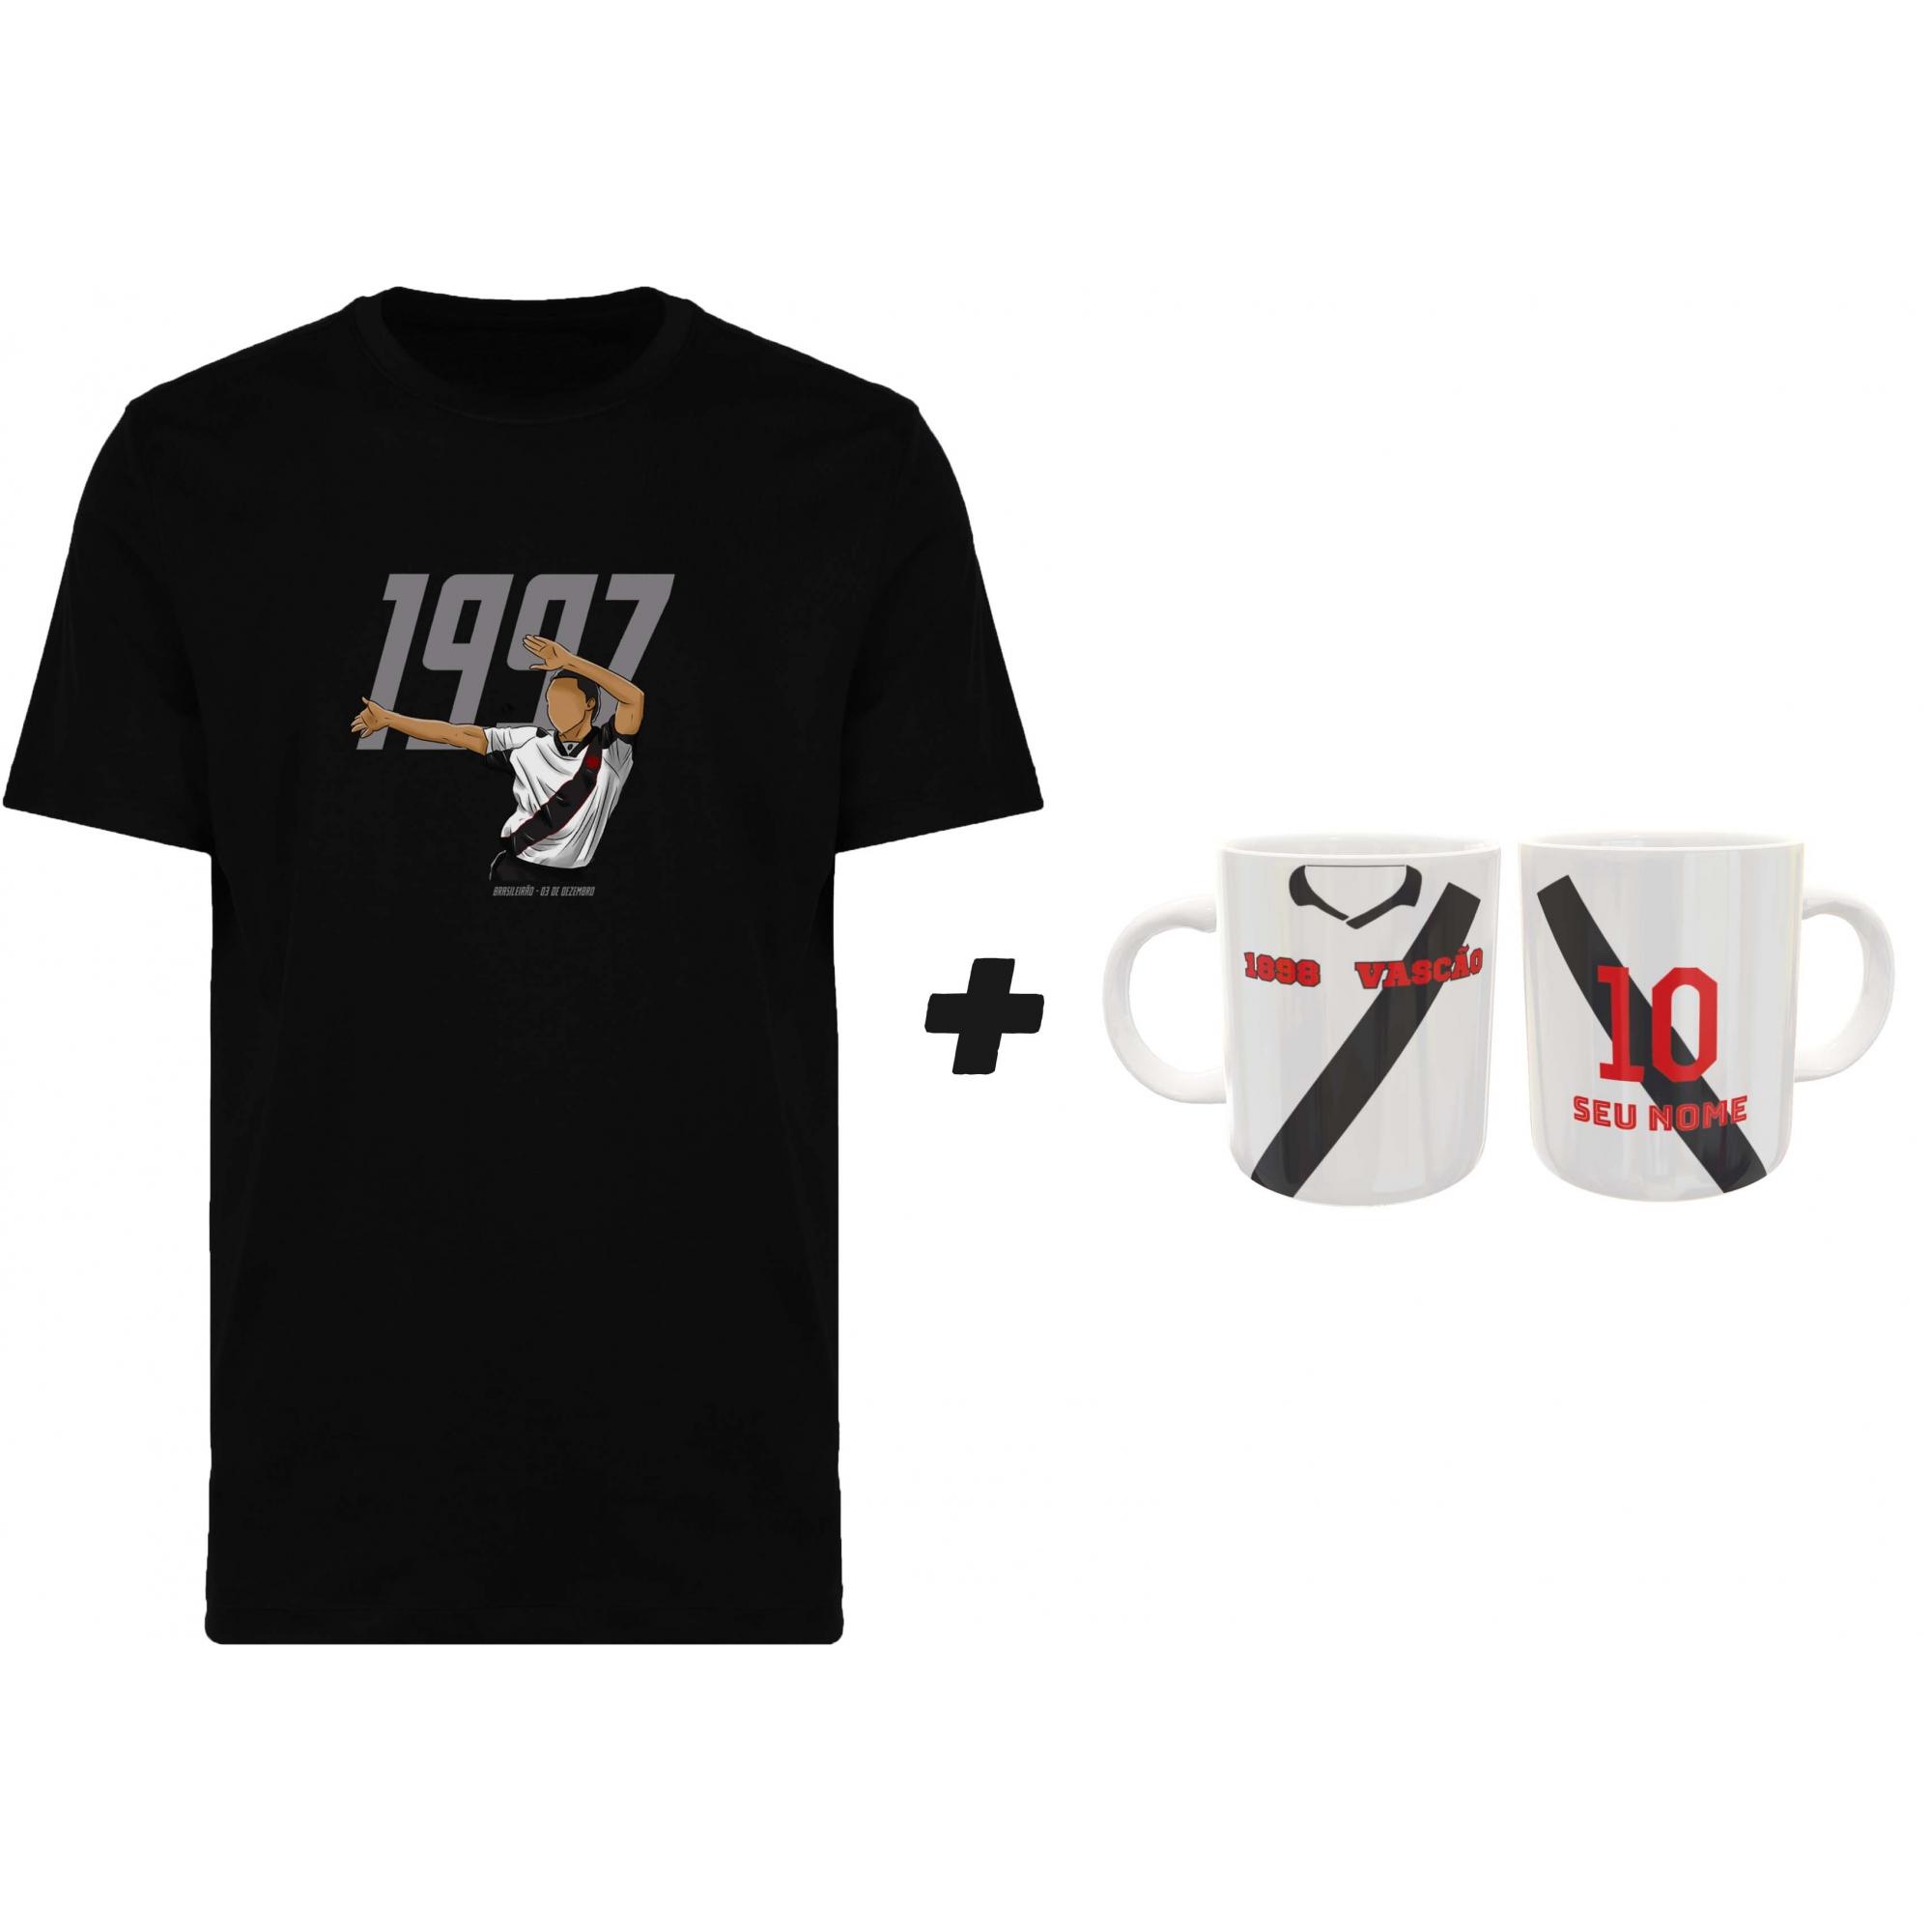 Kit Camiseta + Caneca Vascão